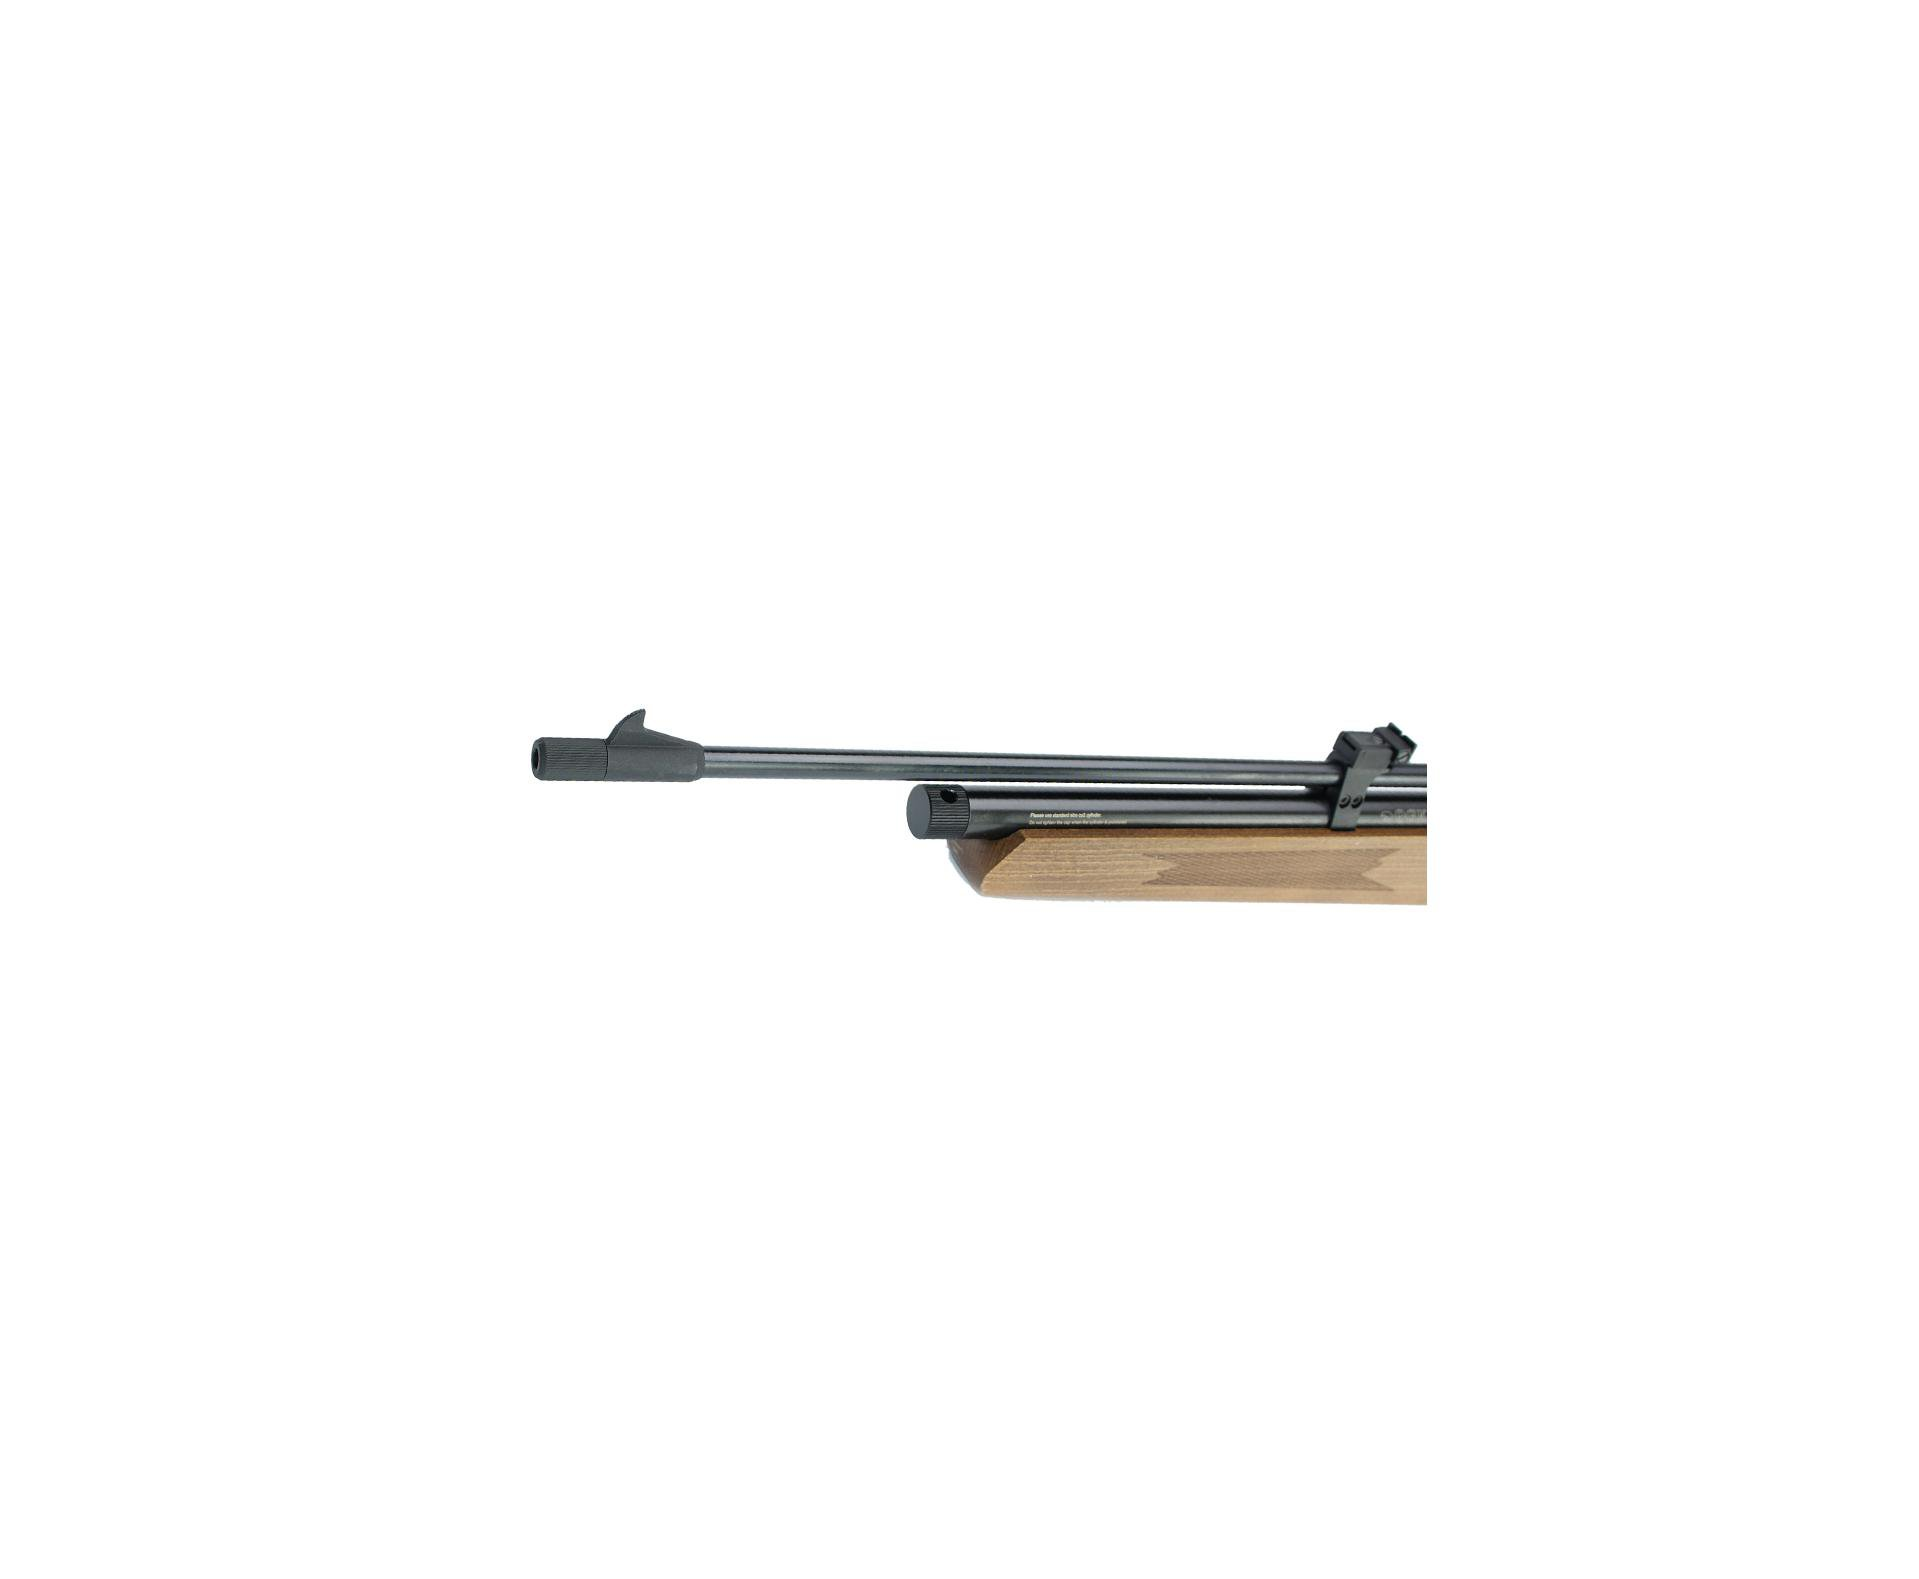 Carabina De Pressão Gas Co2 Cr600w River 7 Tiros 5,5mm Qgk By Spa